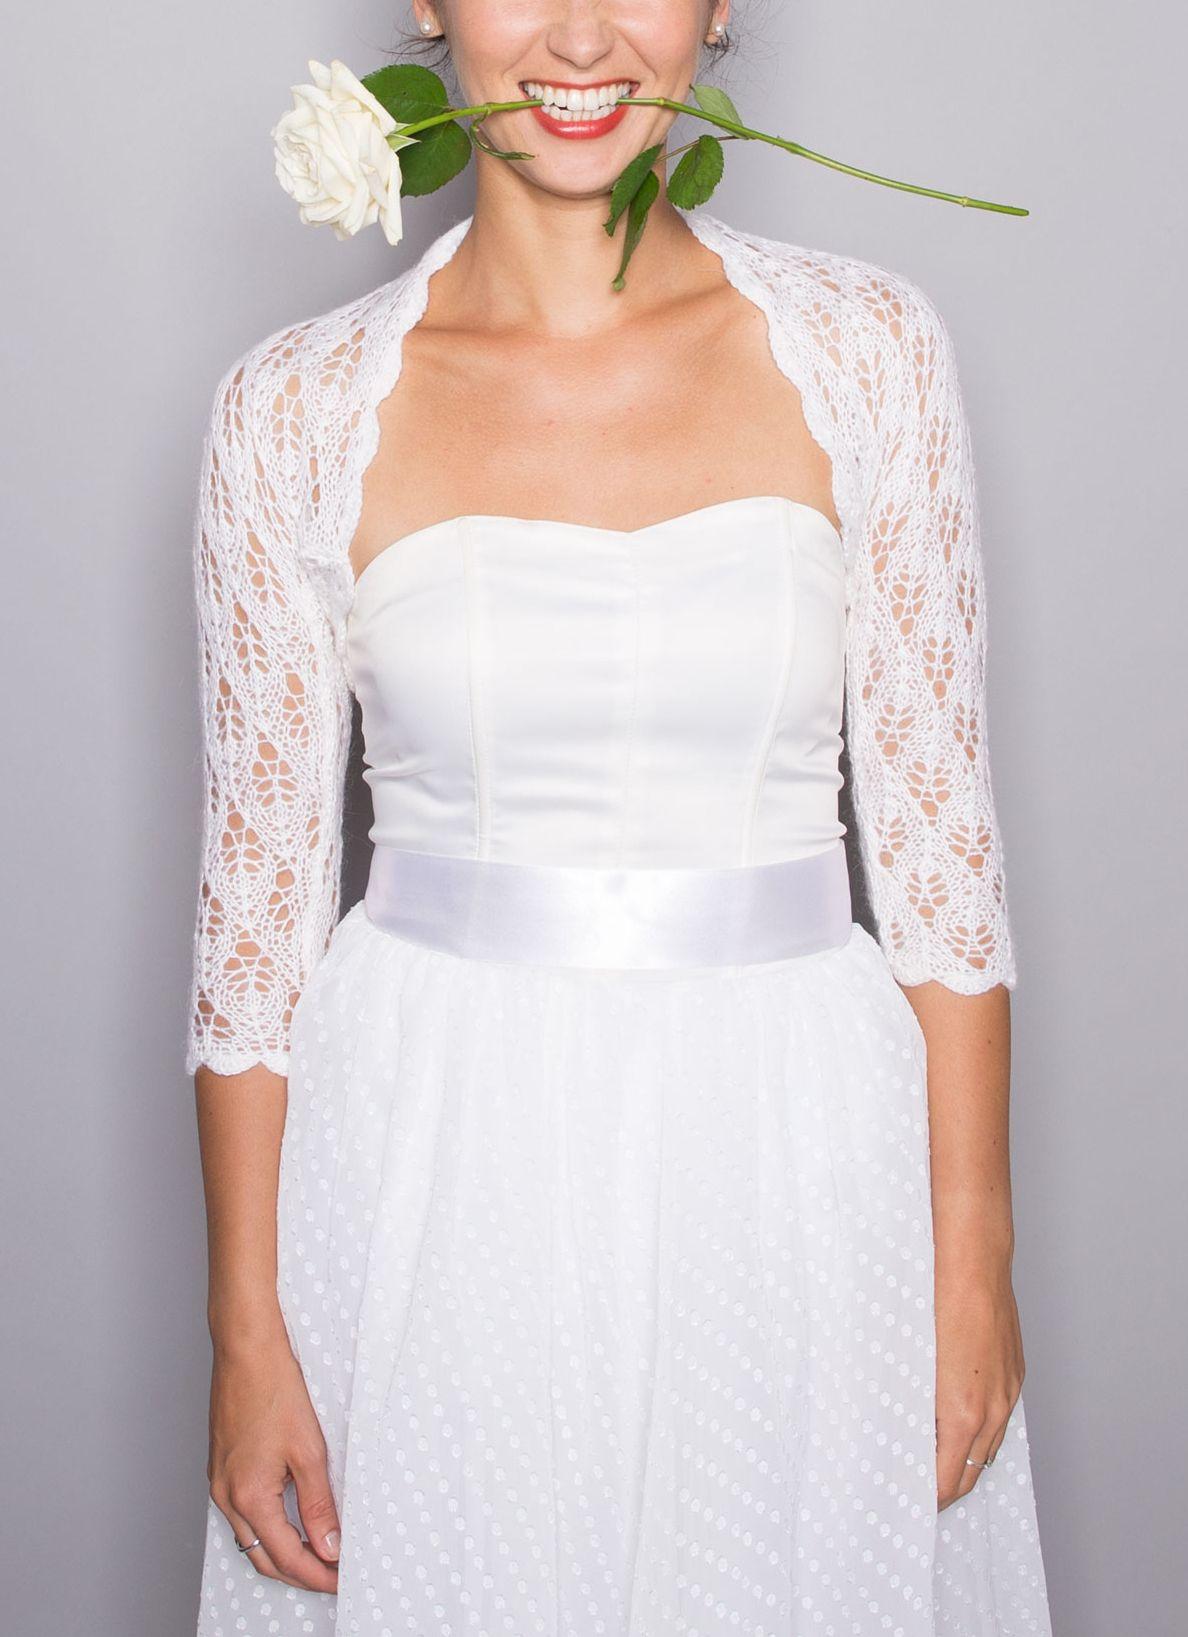 Knitted wedding dress  BRIDAL BOLERO wedding shrug sleeves  leaf pattern lace knitted